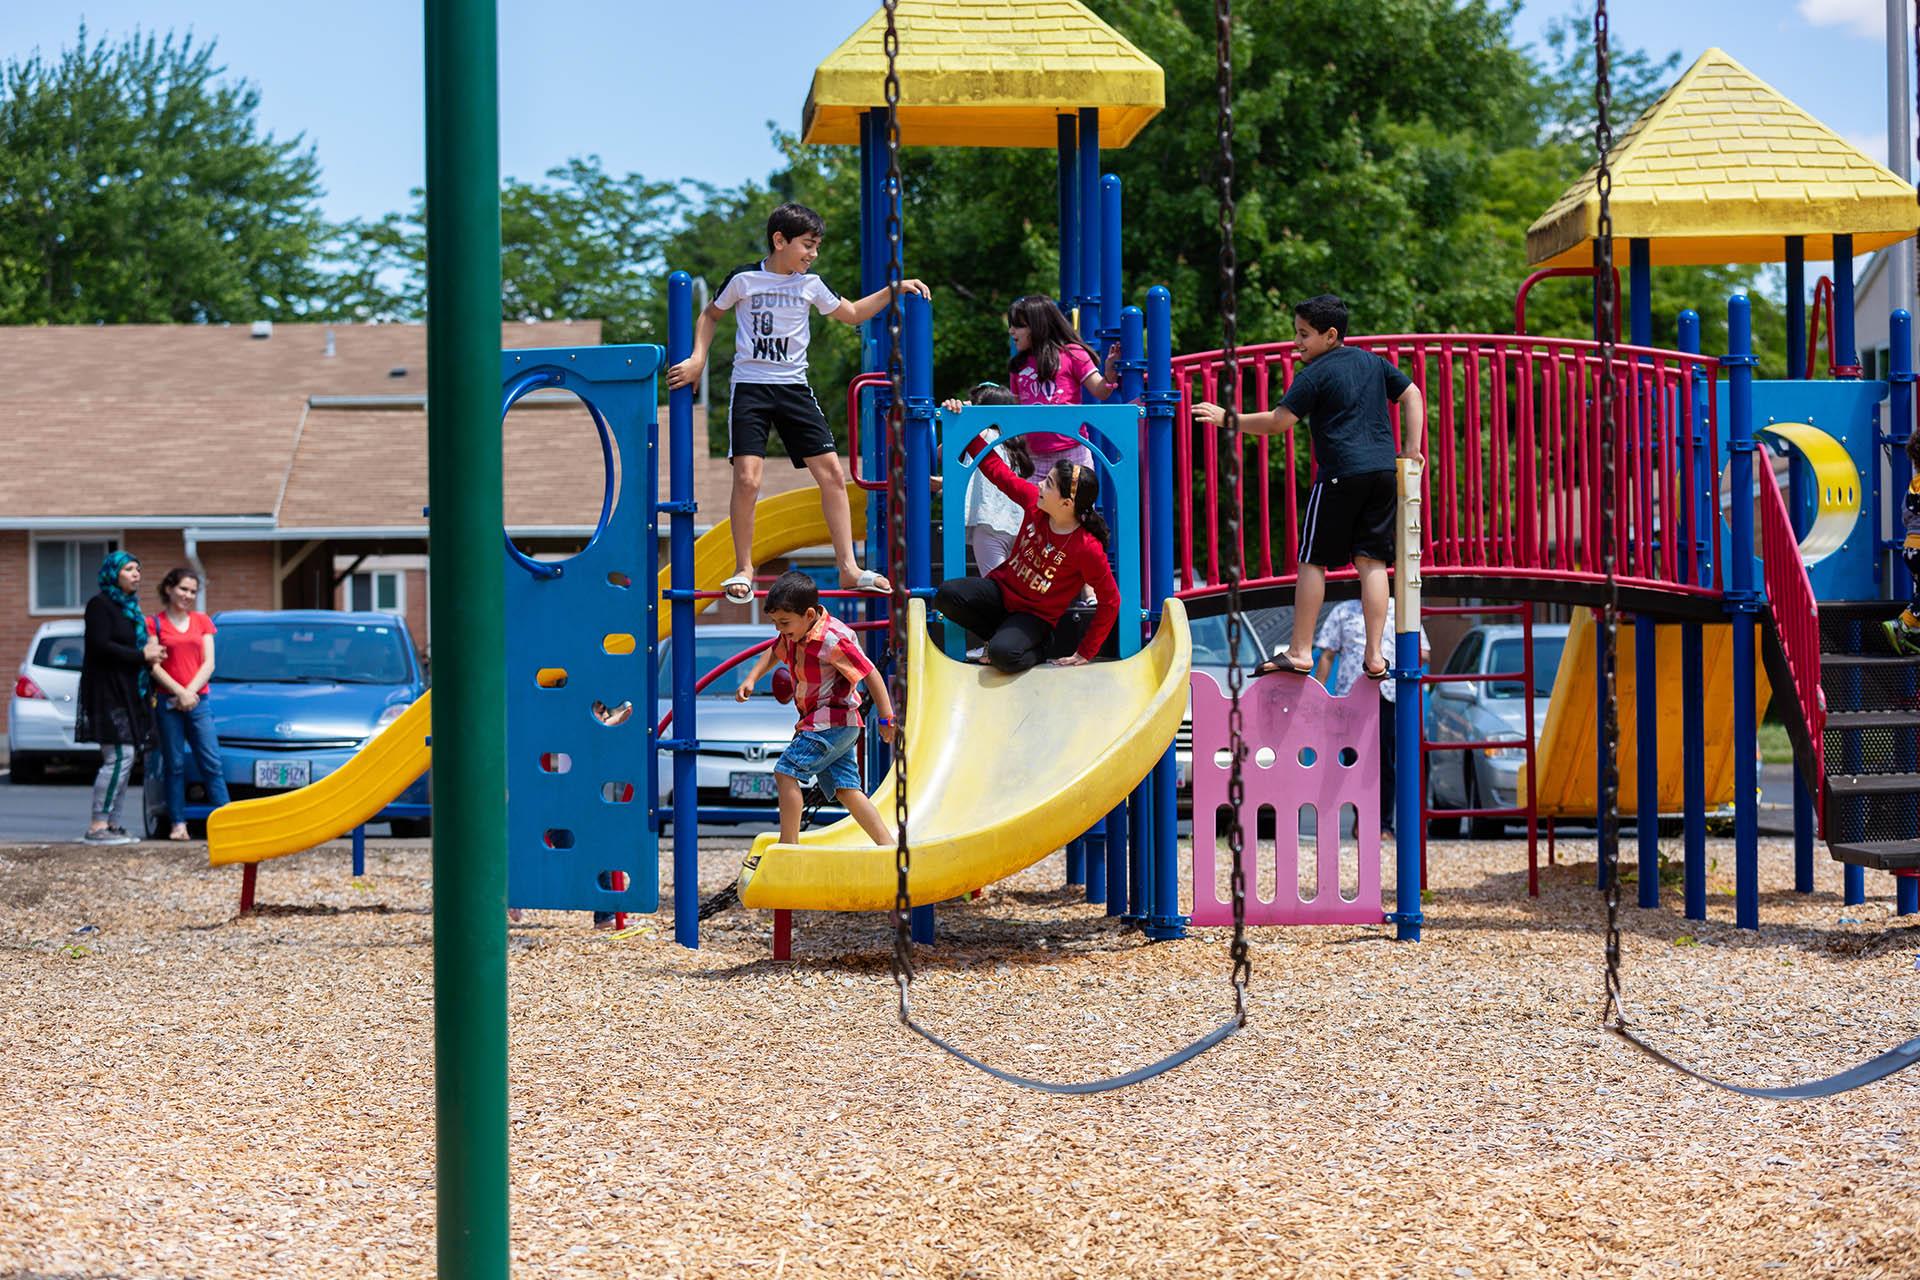 orchard court family housing playground oregon state university